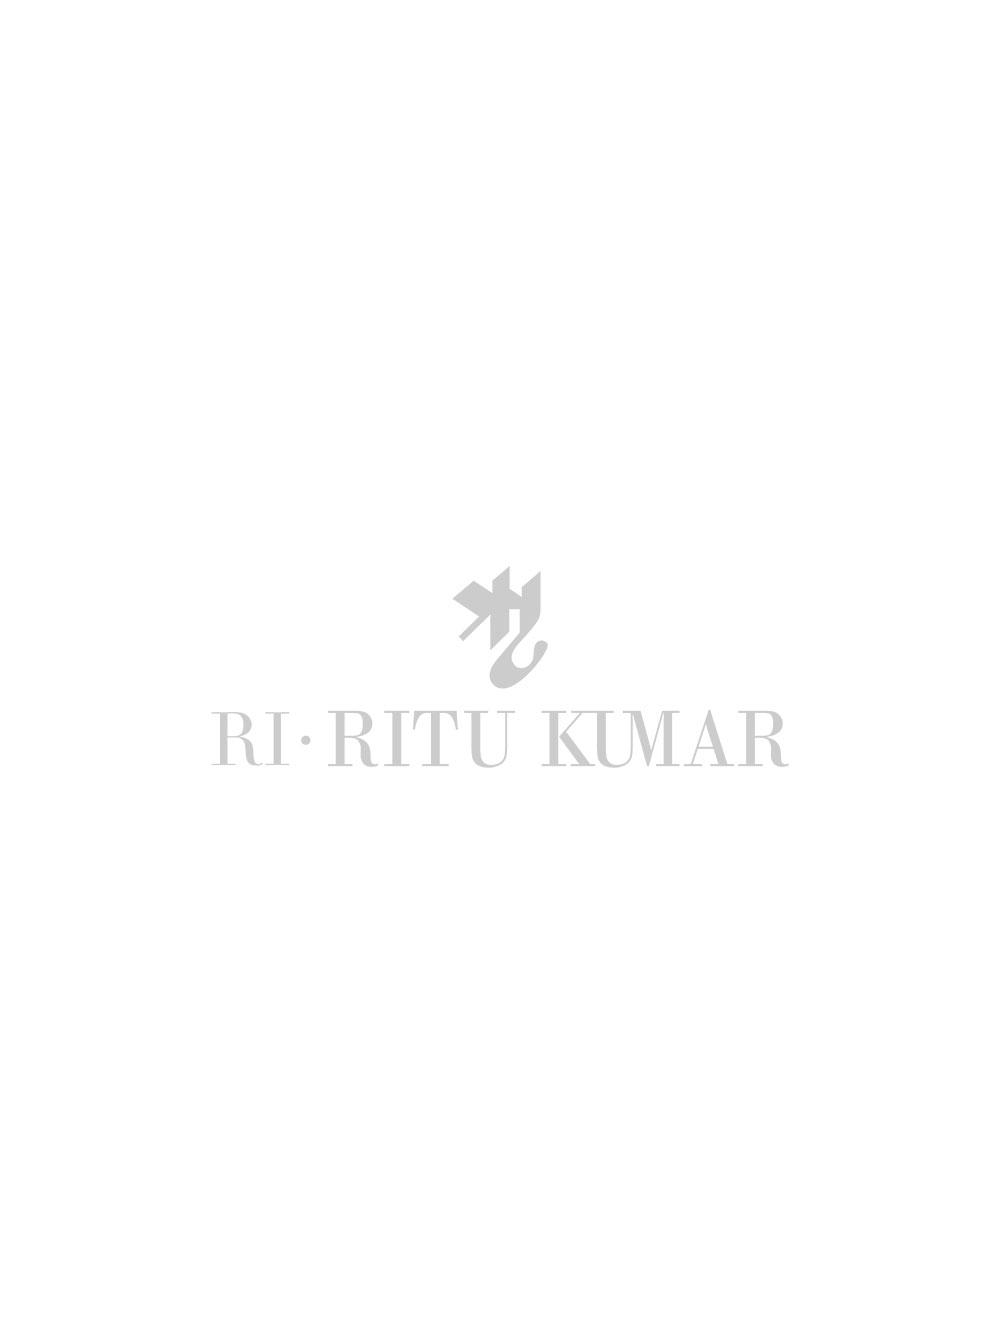 Khaki & Off White Embroidered Suit Set